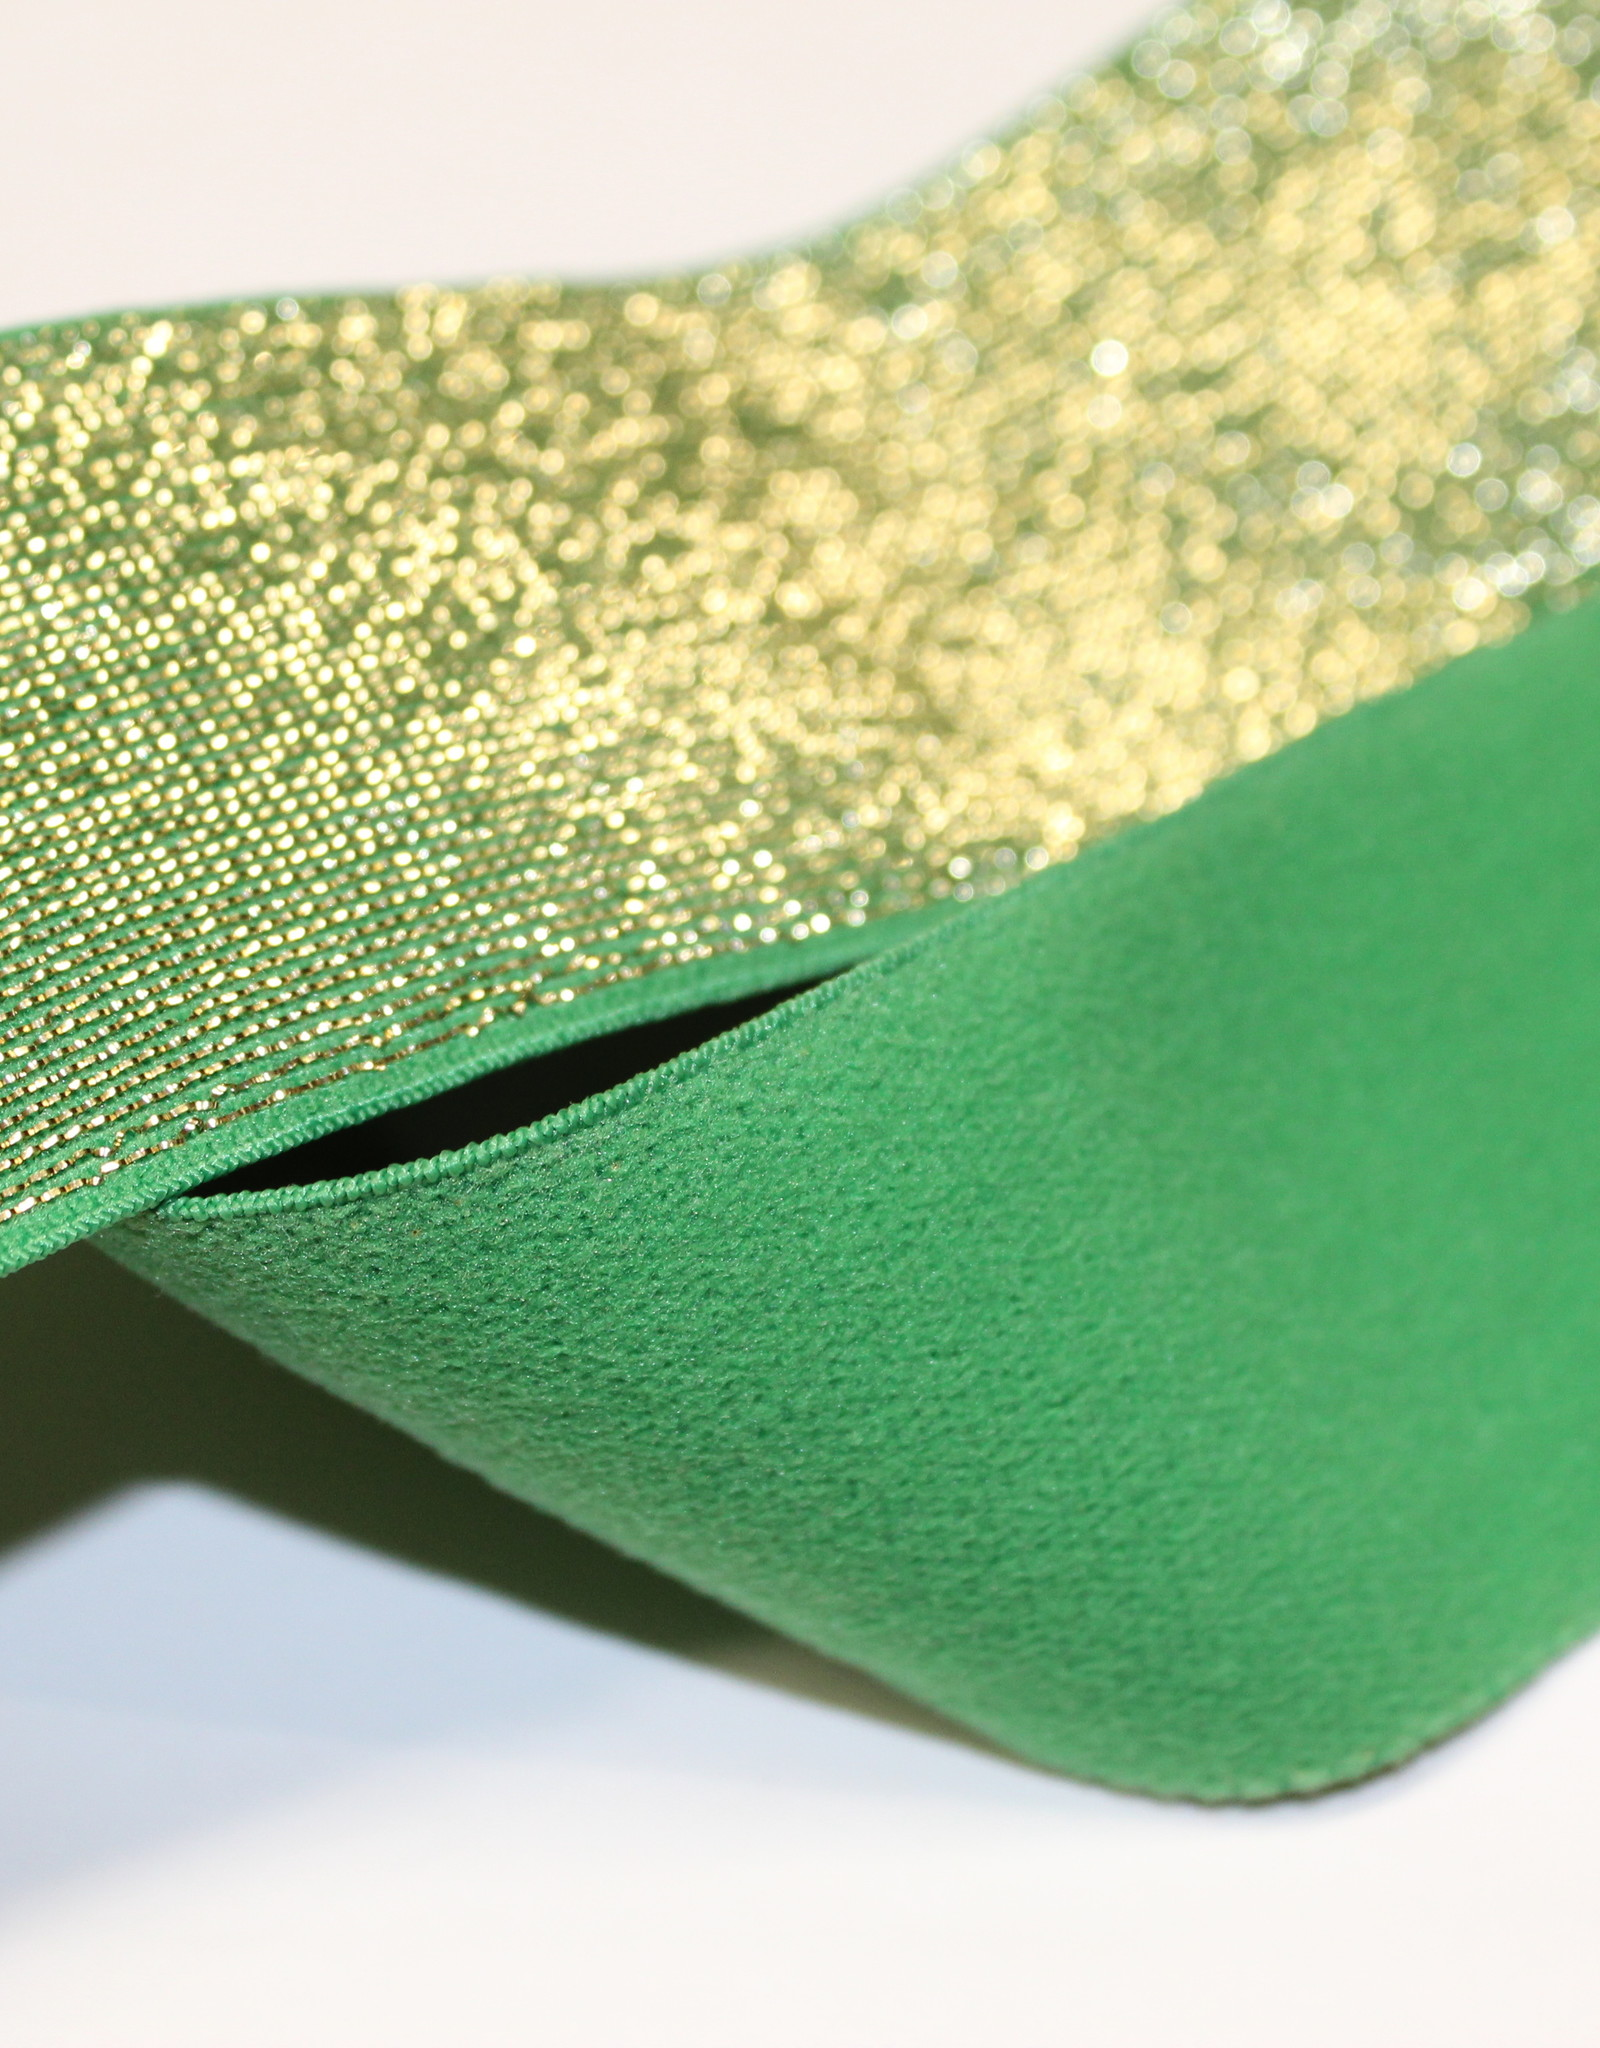 Elastiek groen gouden glitter 40mm